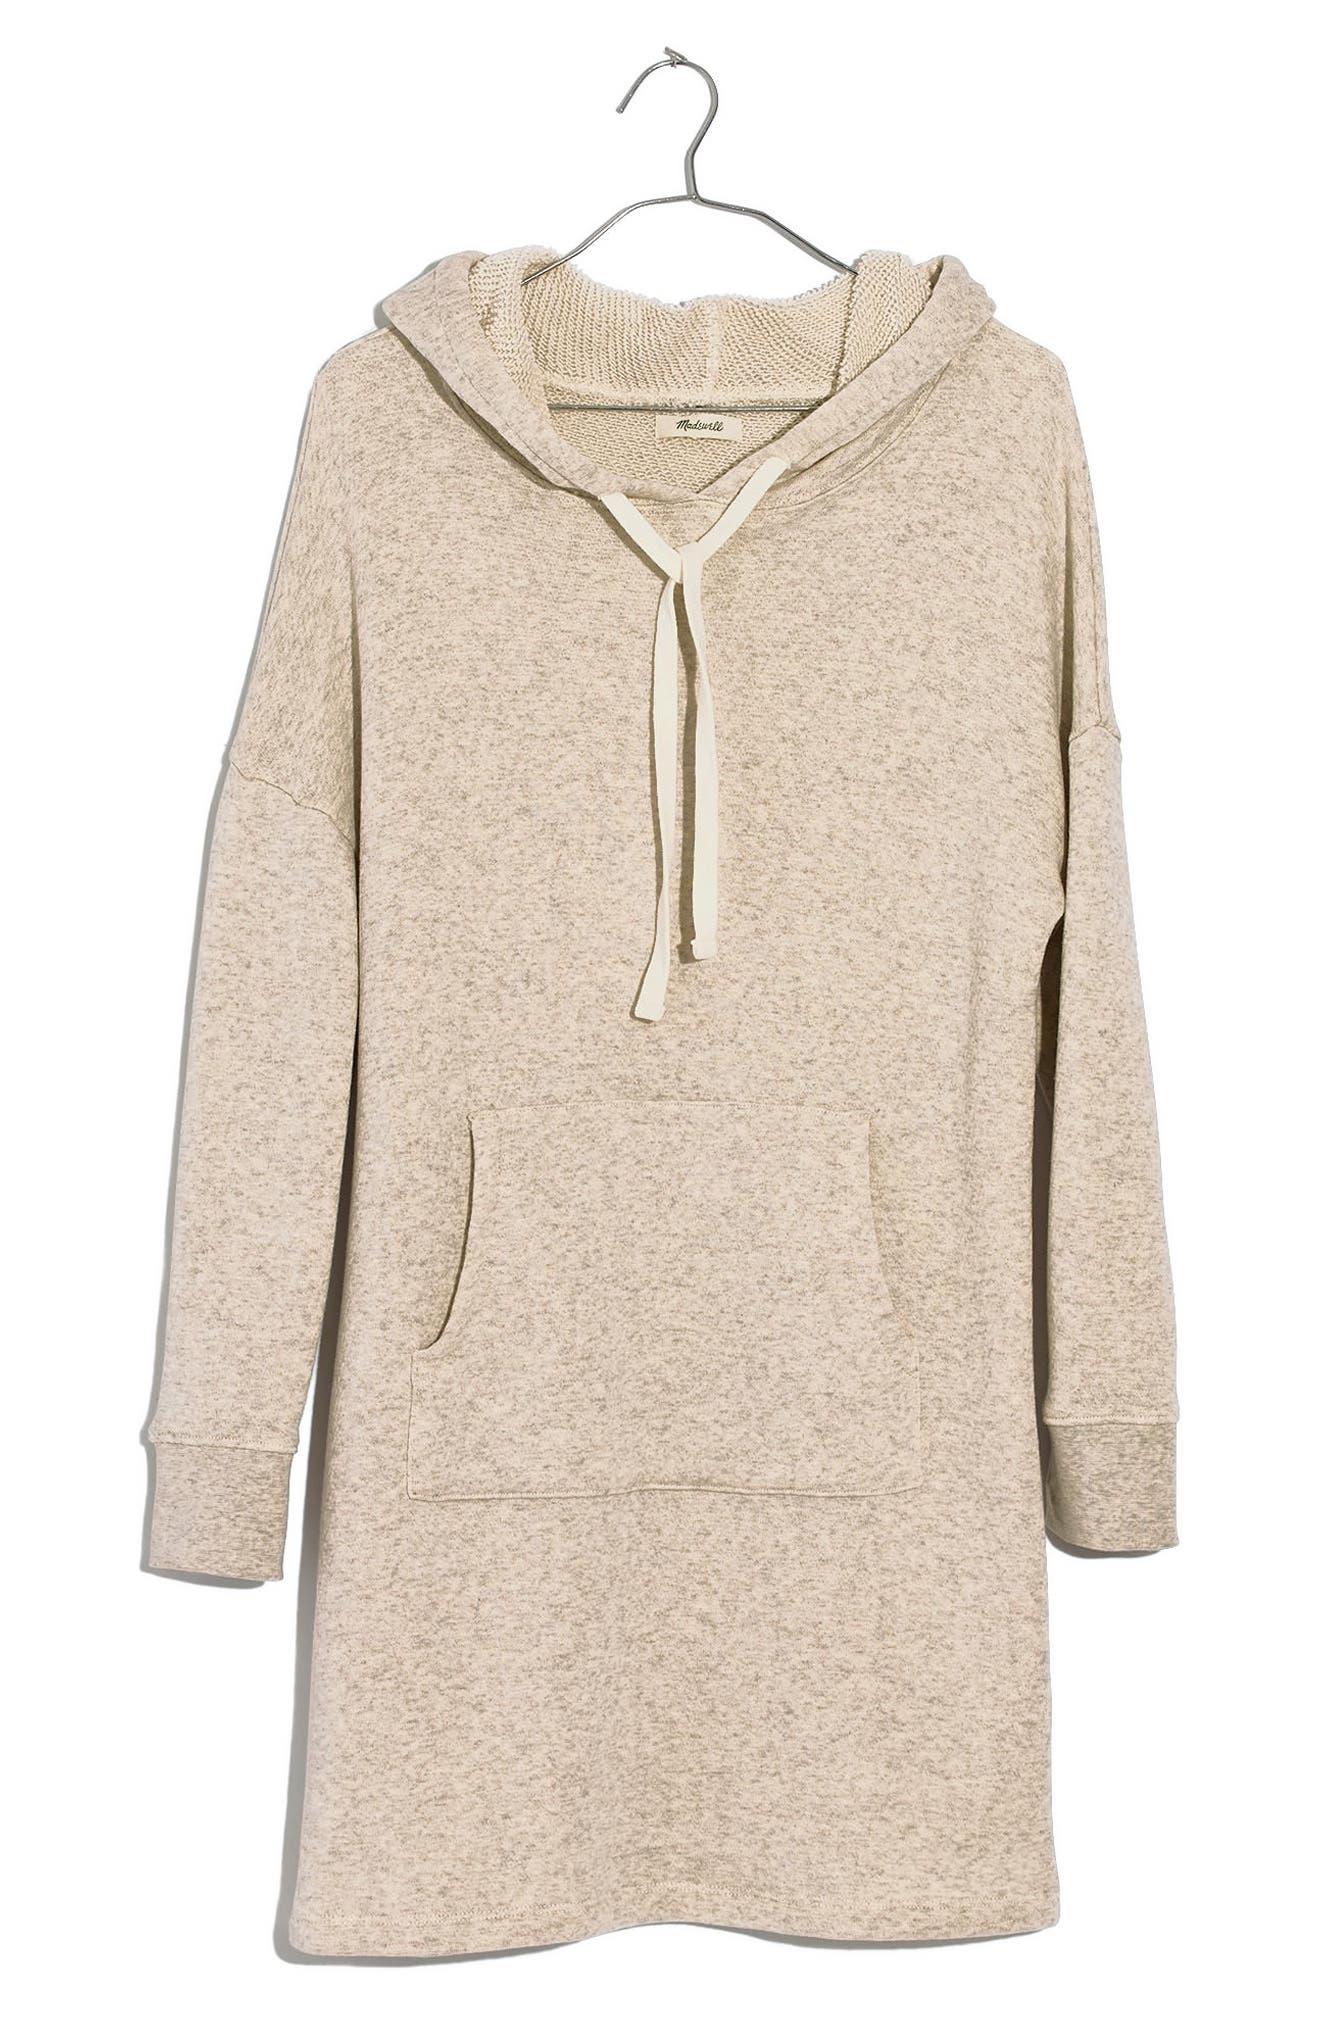 Main Image - Madewell Hooded Sweatshirt Dress